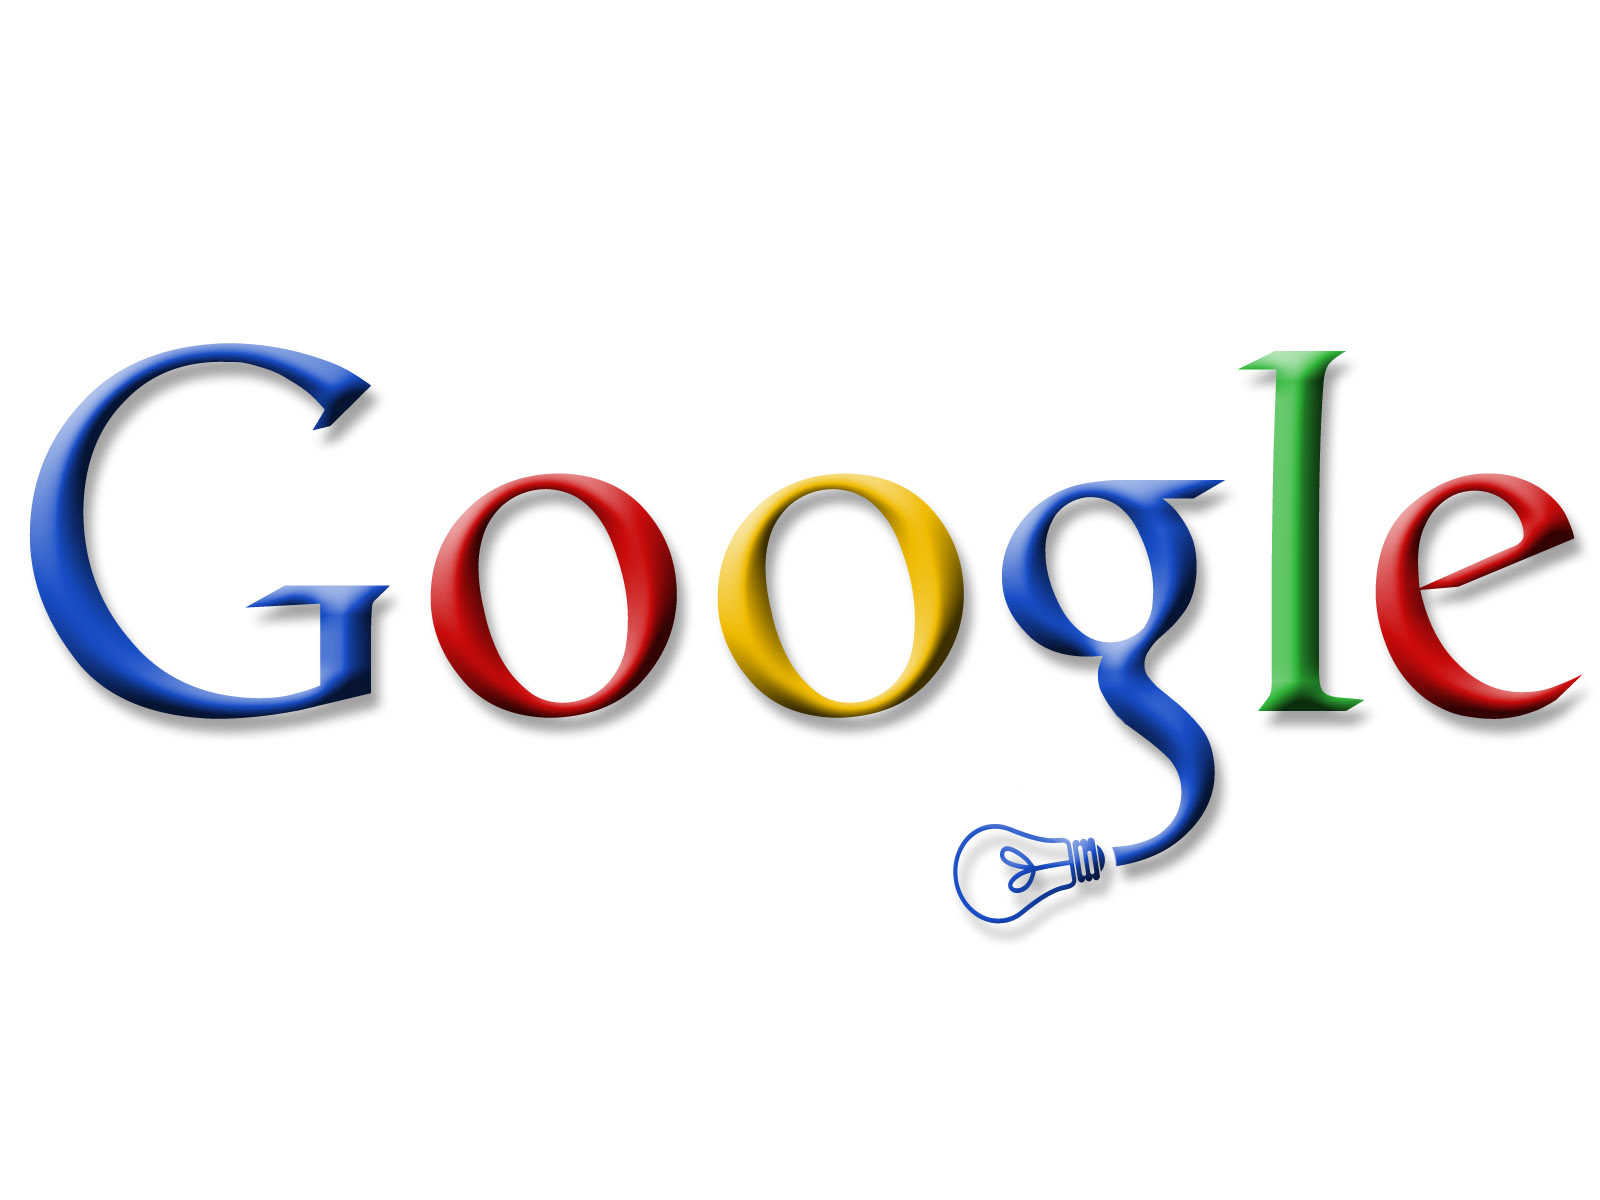 Google lance la recherche web cryptée